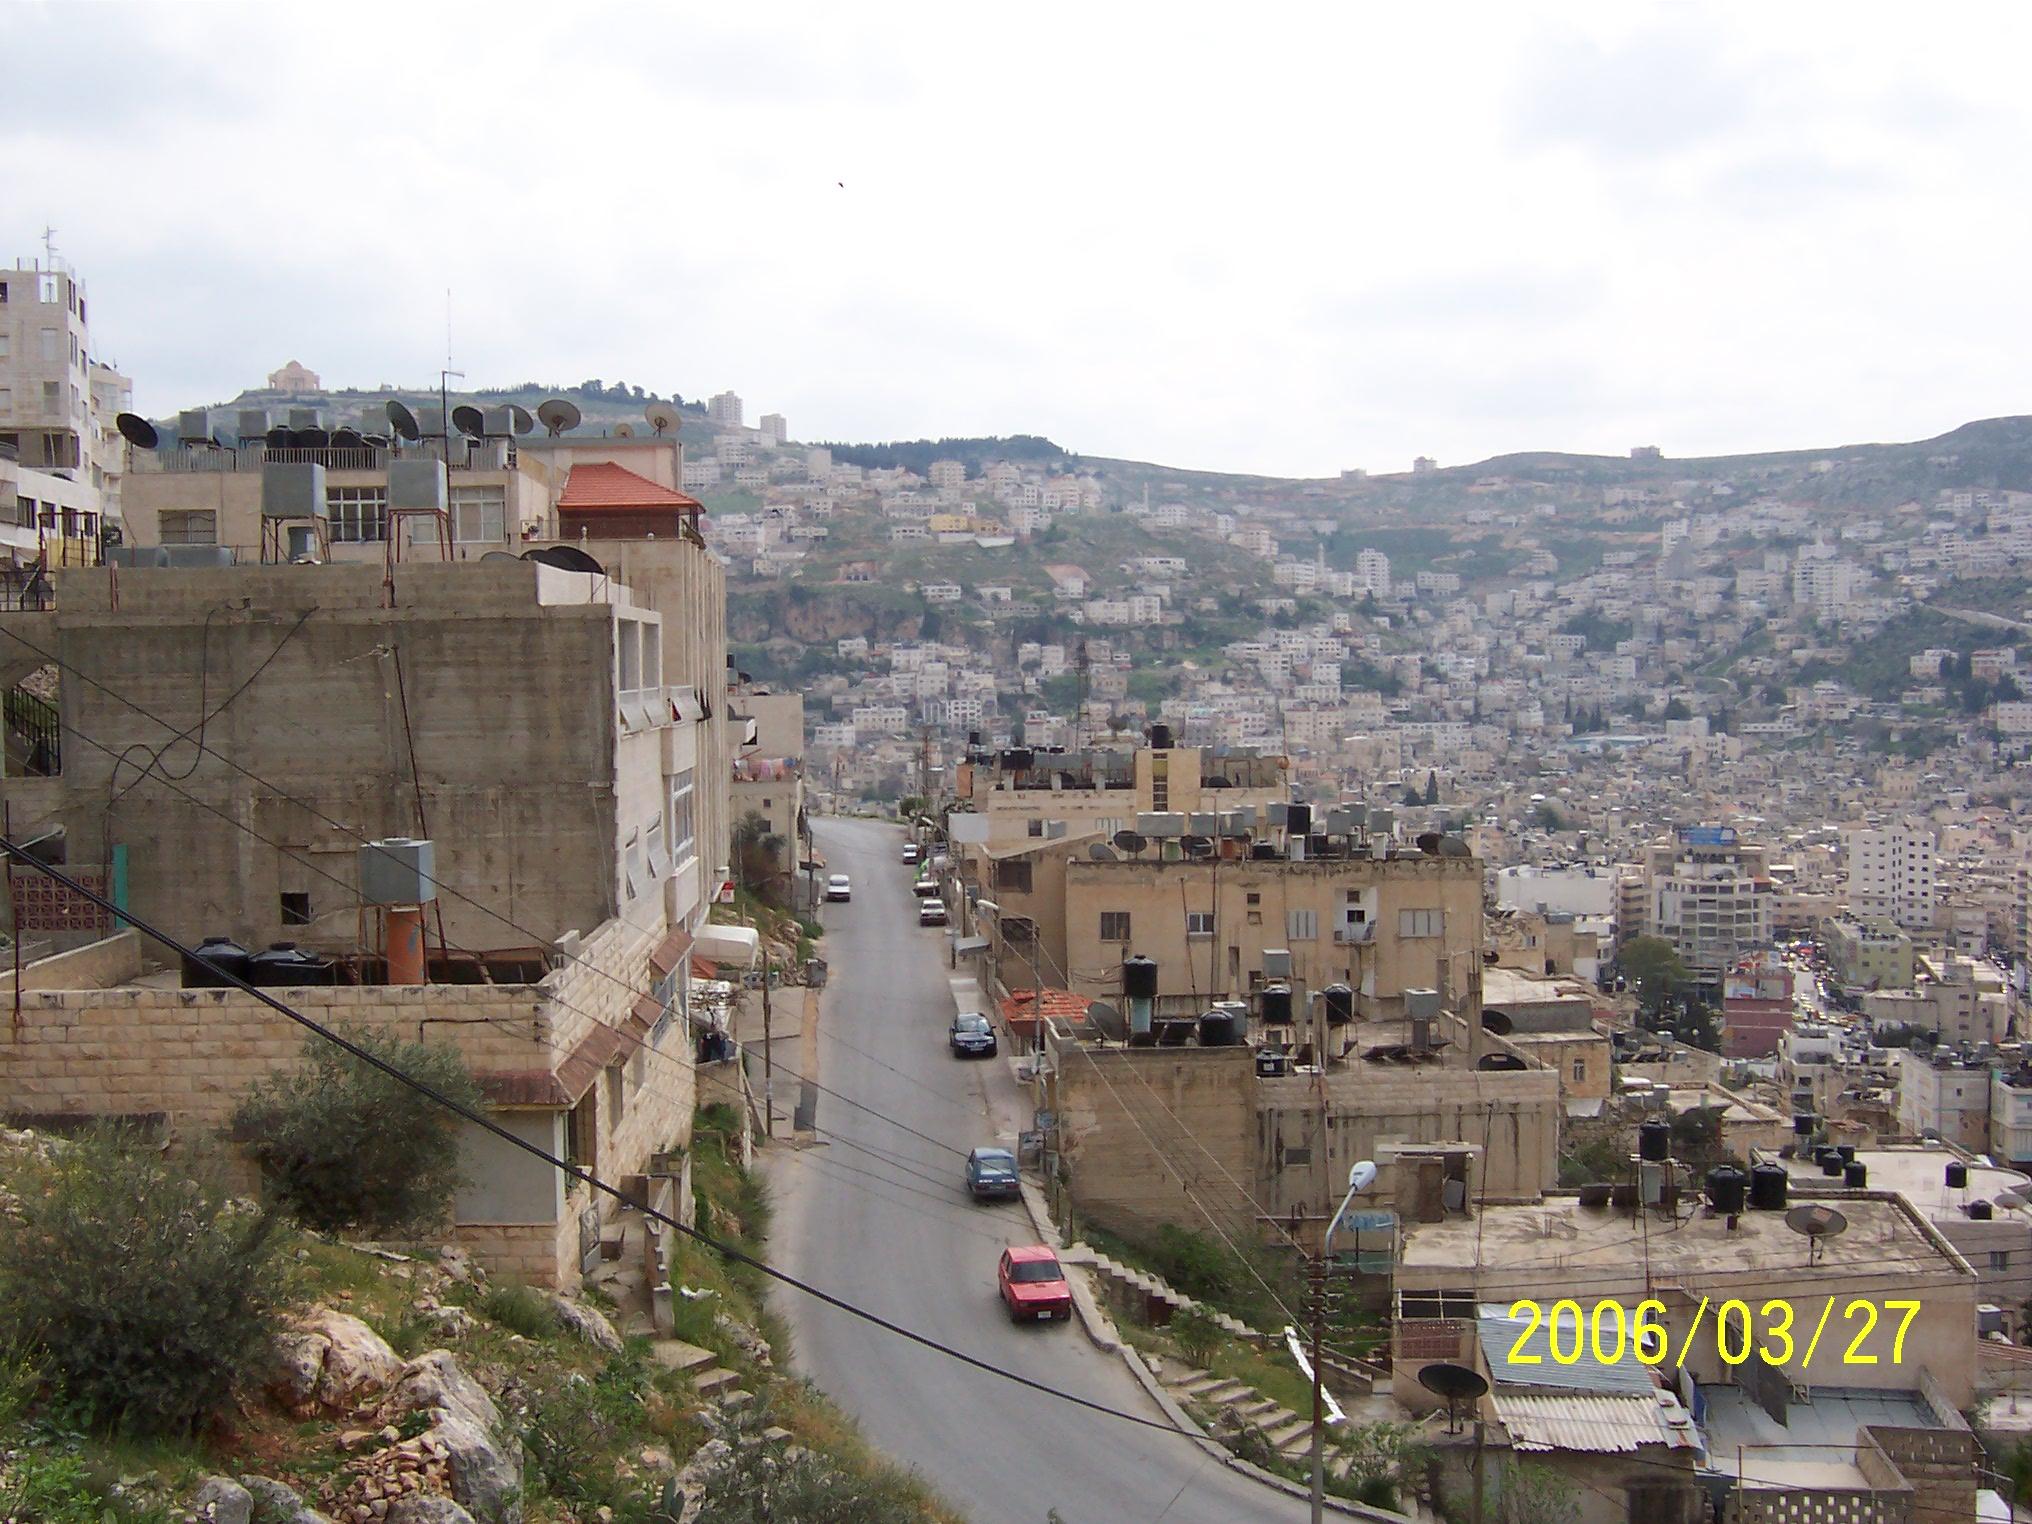 Nablus-Nablus: Nablus جسر التيتي 3 /67808 - Palestine ...